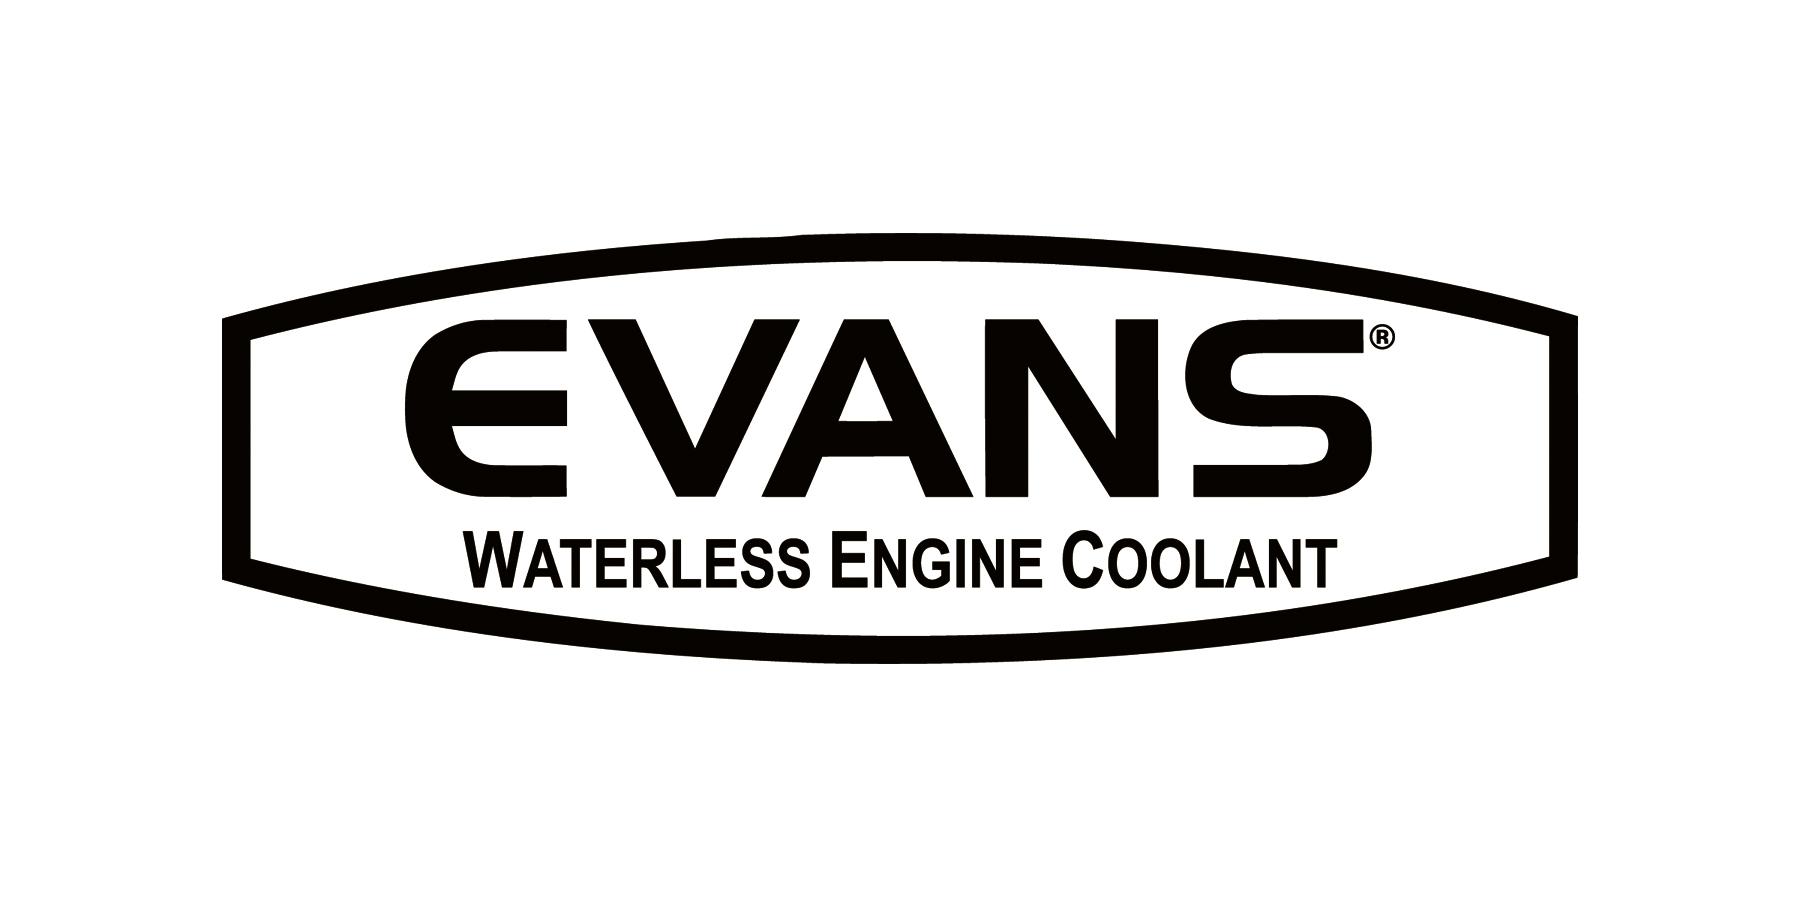 Cool Runnings Evans Waterless Engine Coolant